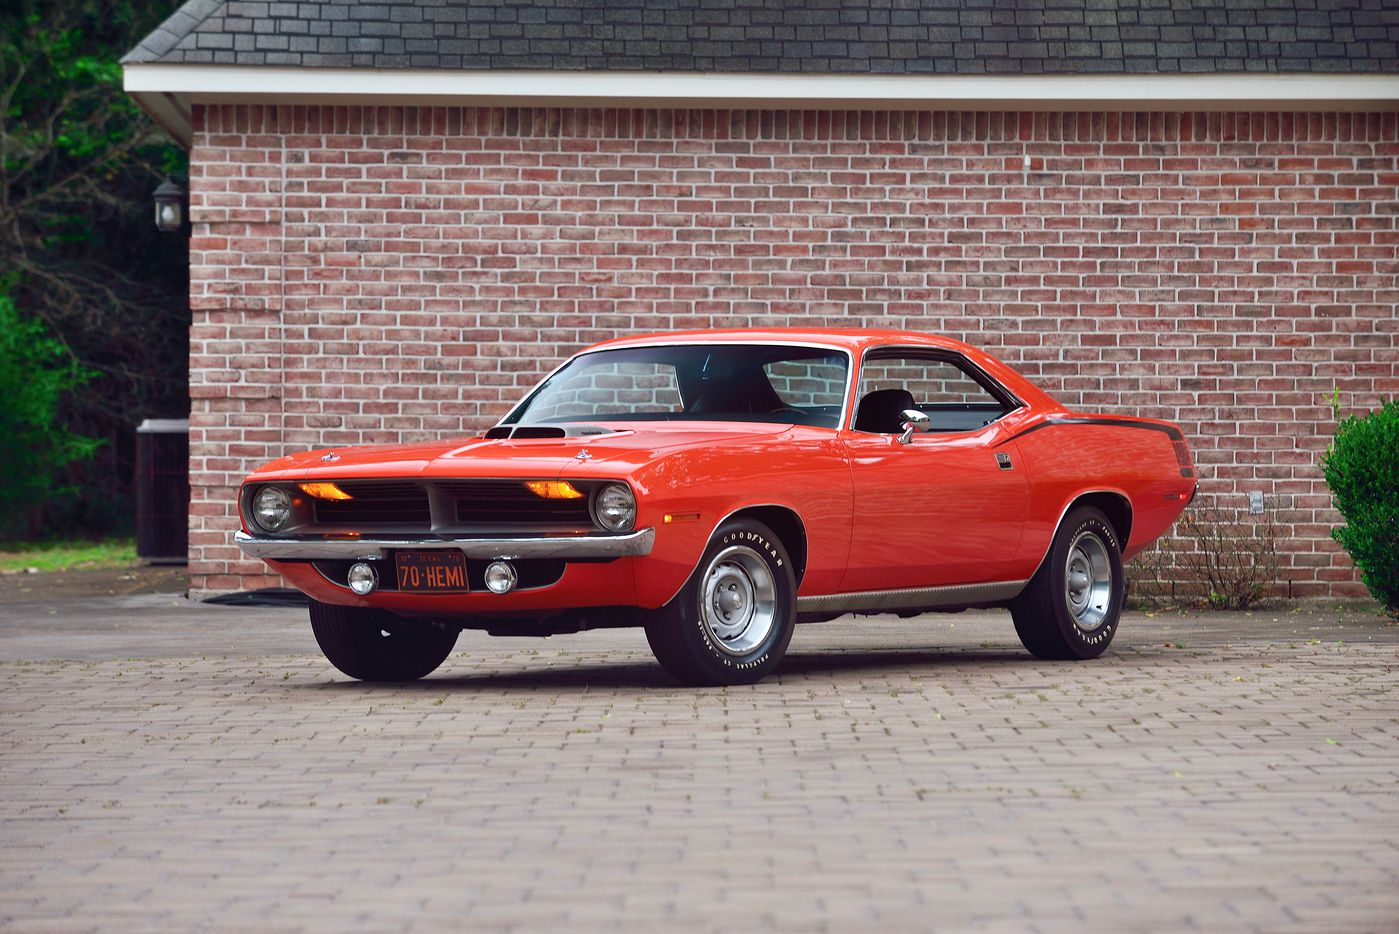 Lot S93 1970 Plymouth Hemi Cuda (Mecum)